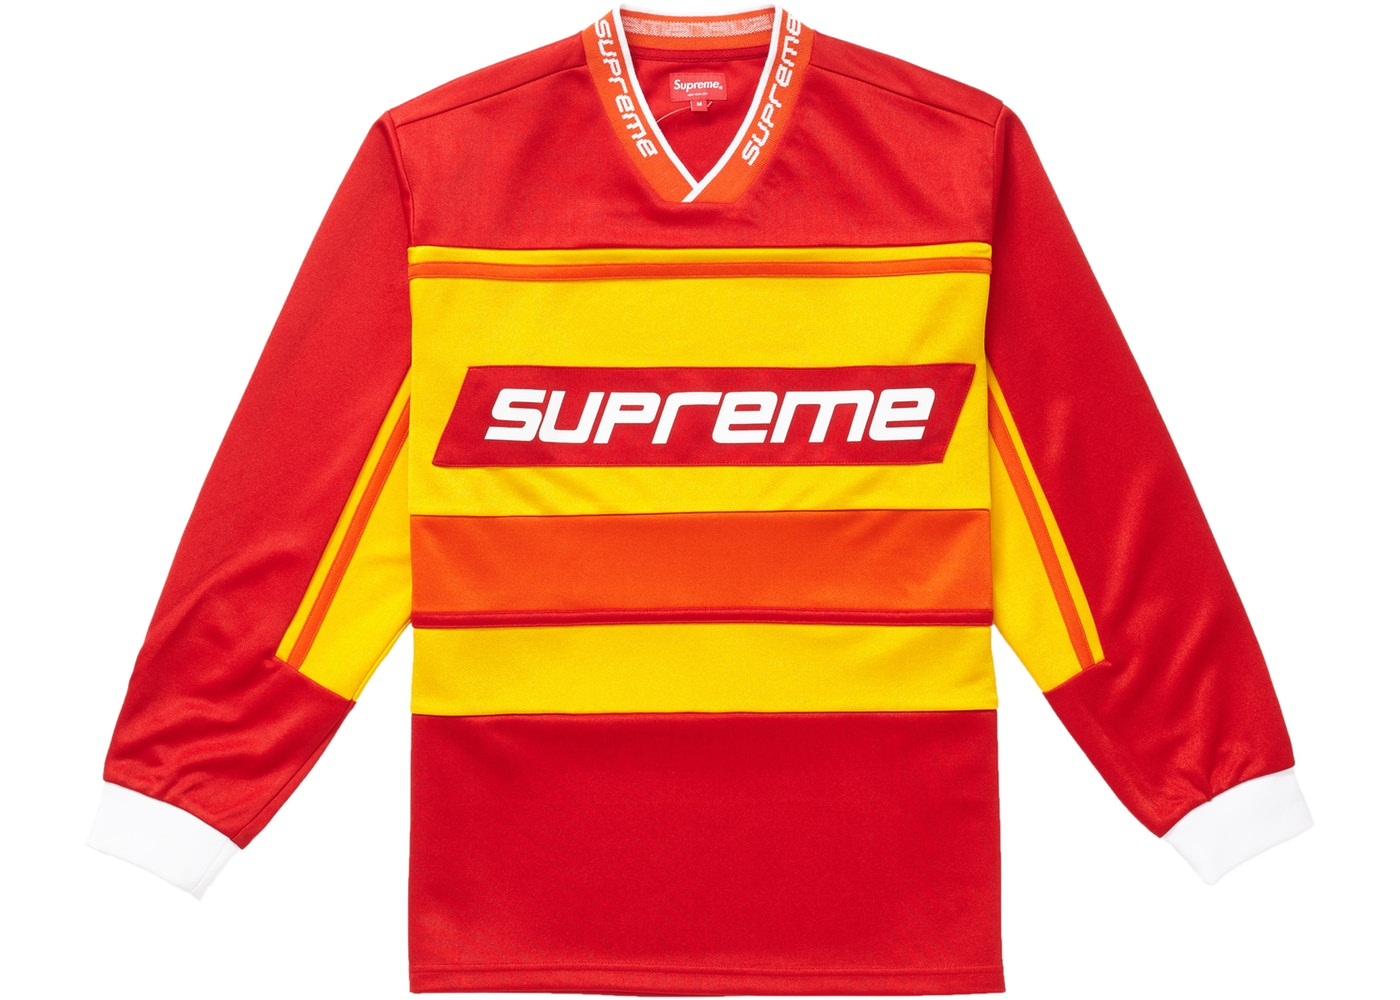 Supreme Warm Up Hockey Jersey Red - FW18 8e5b3622665